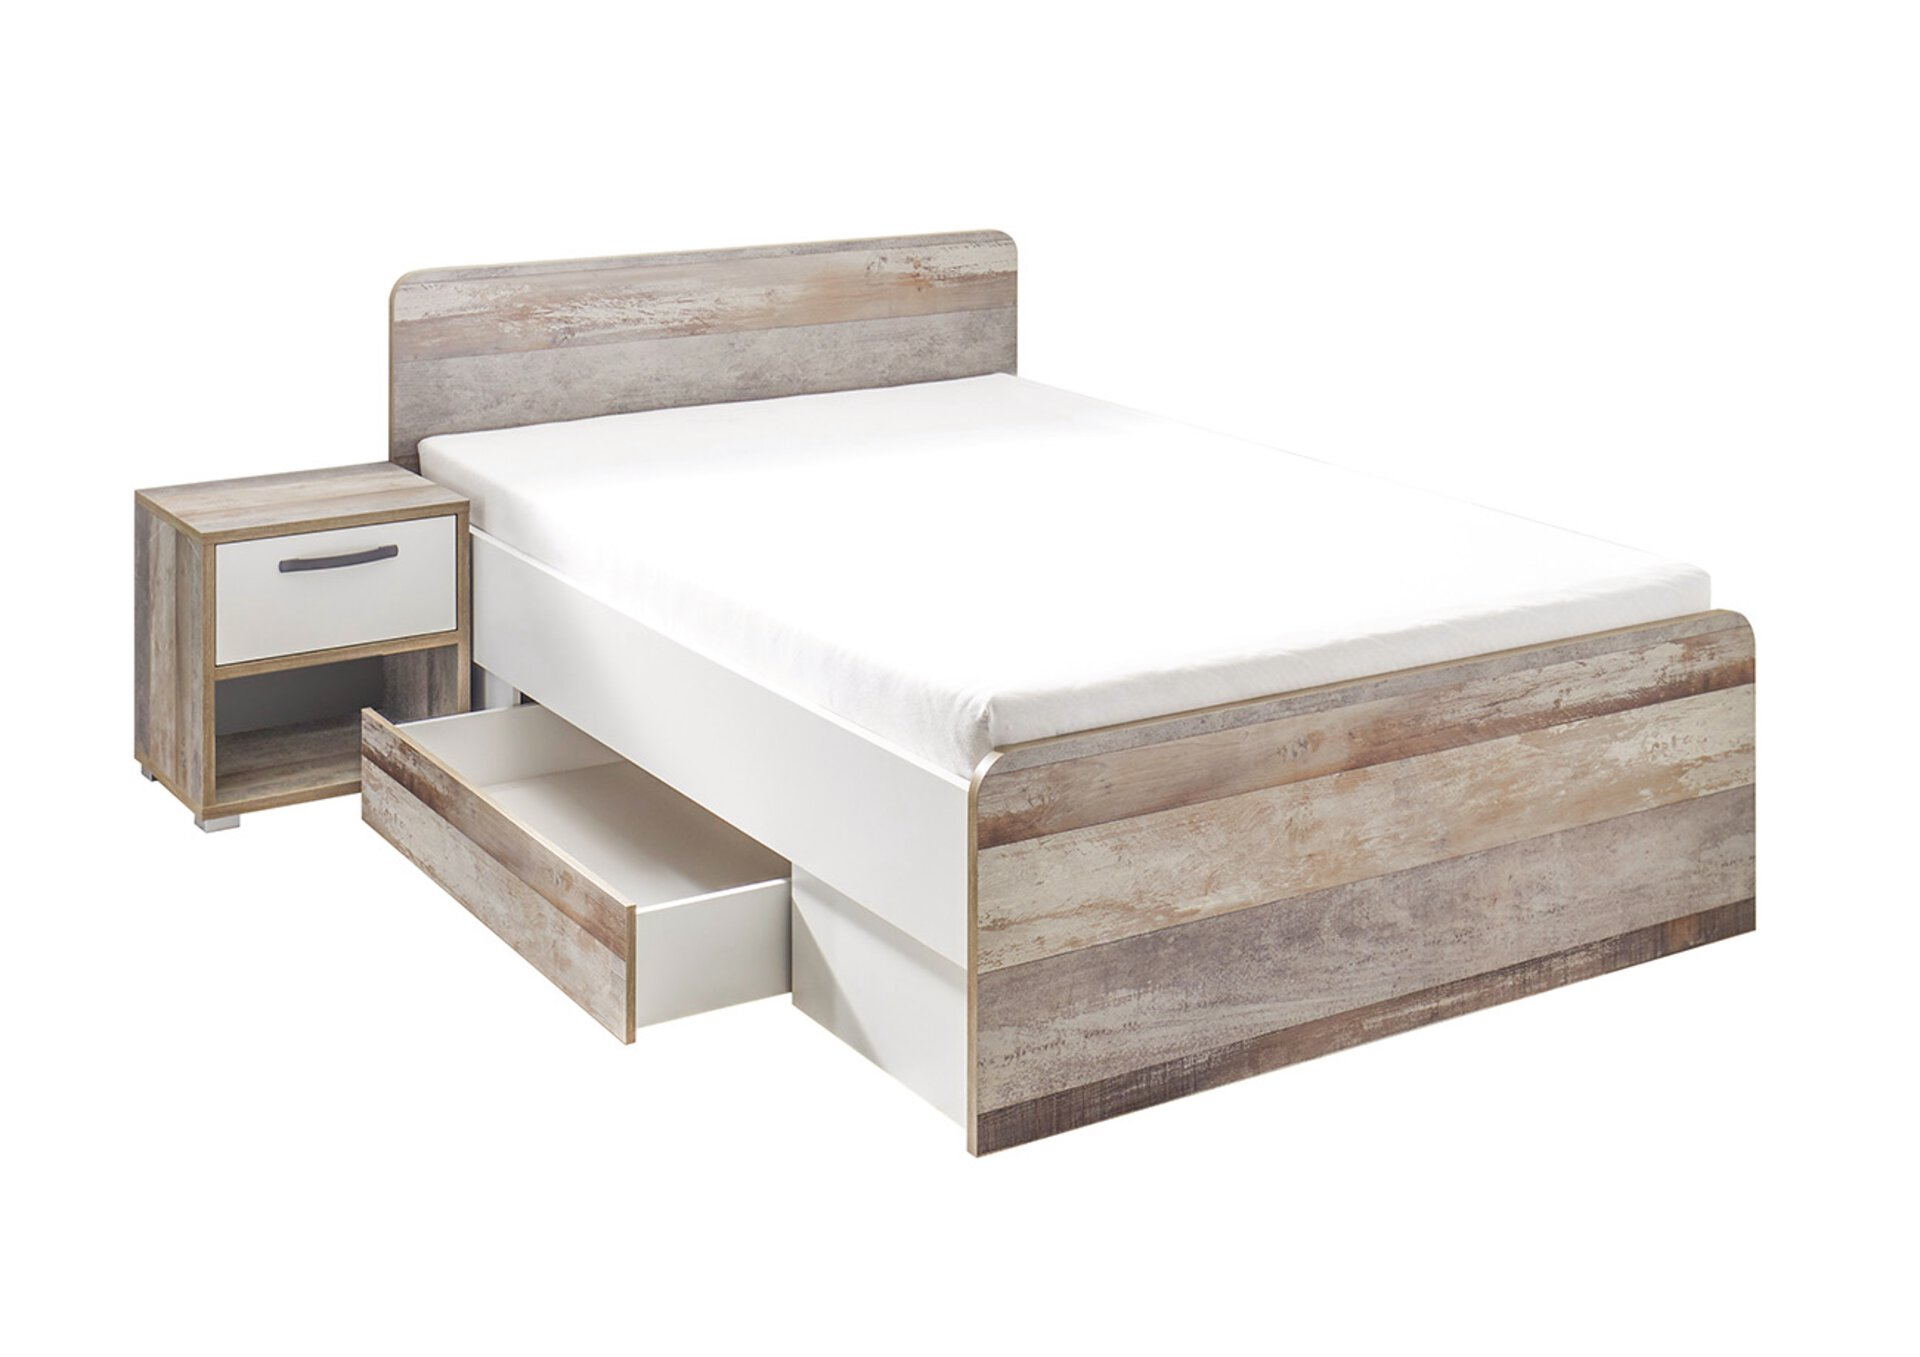 Kinderbett MOON inbuy Holzwerkstoff grau 146 x 89 x 205 cm